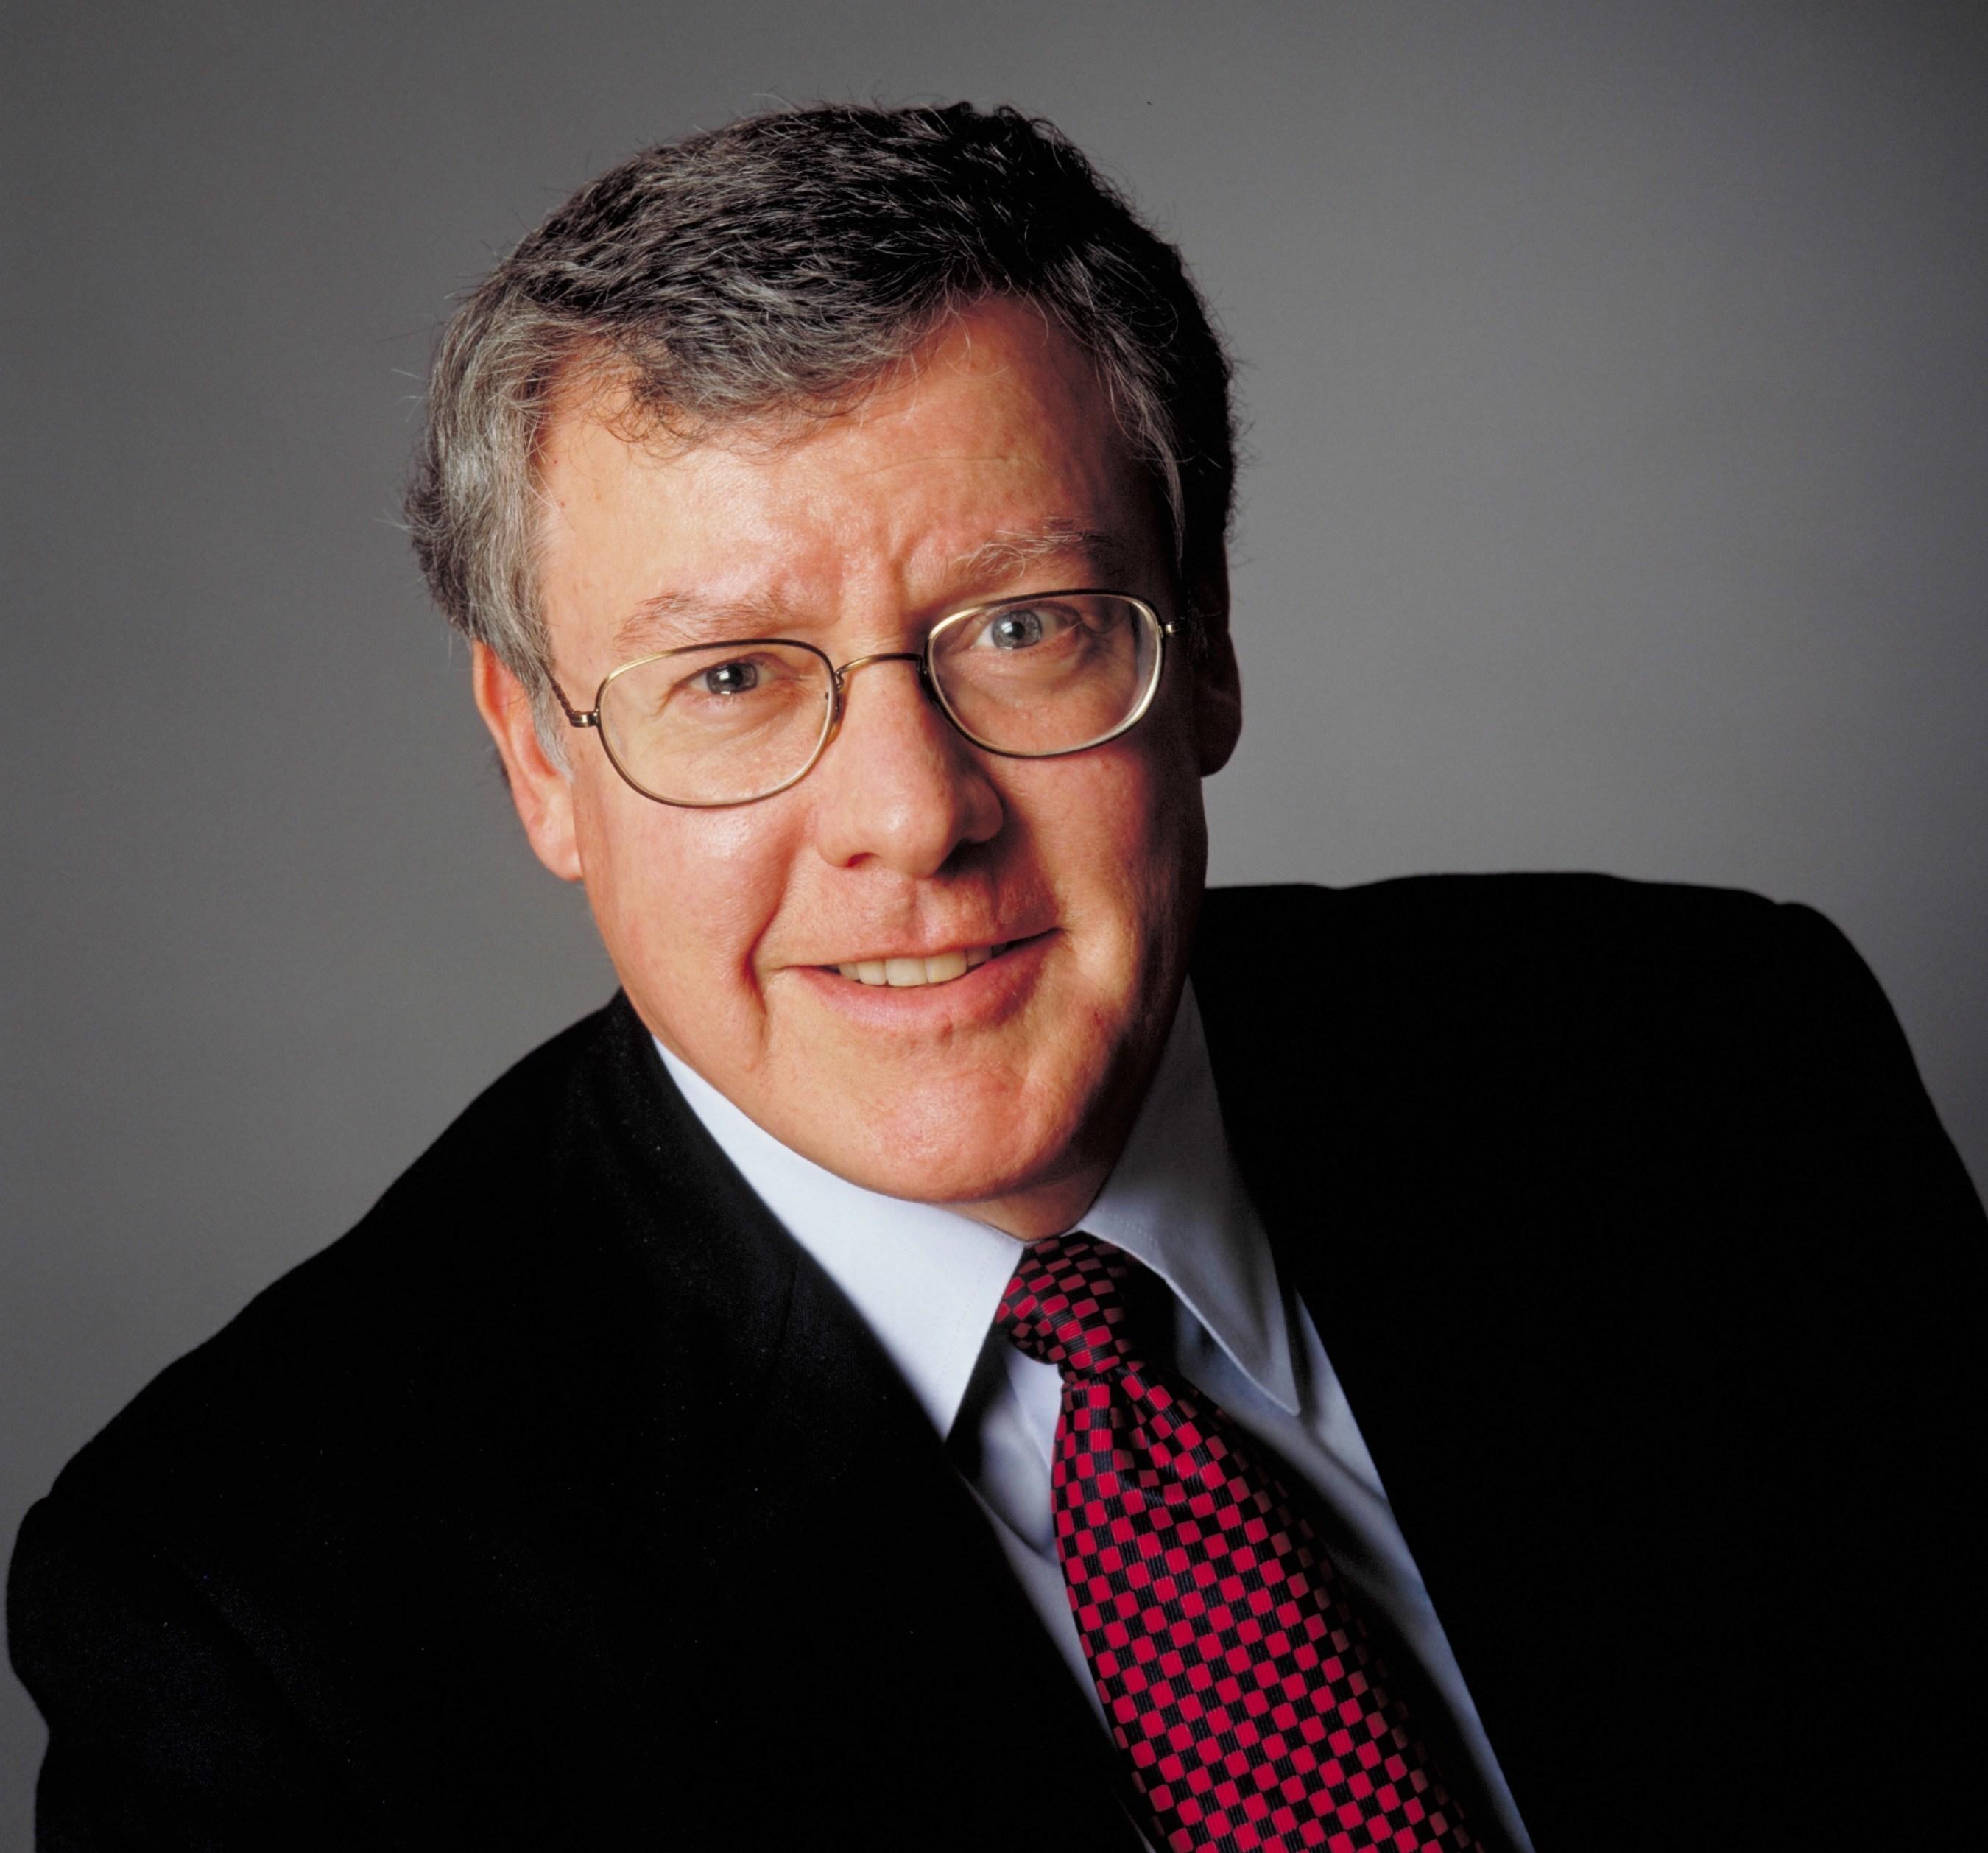 Jim Rothenberg, Capital Group